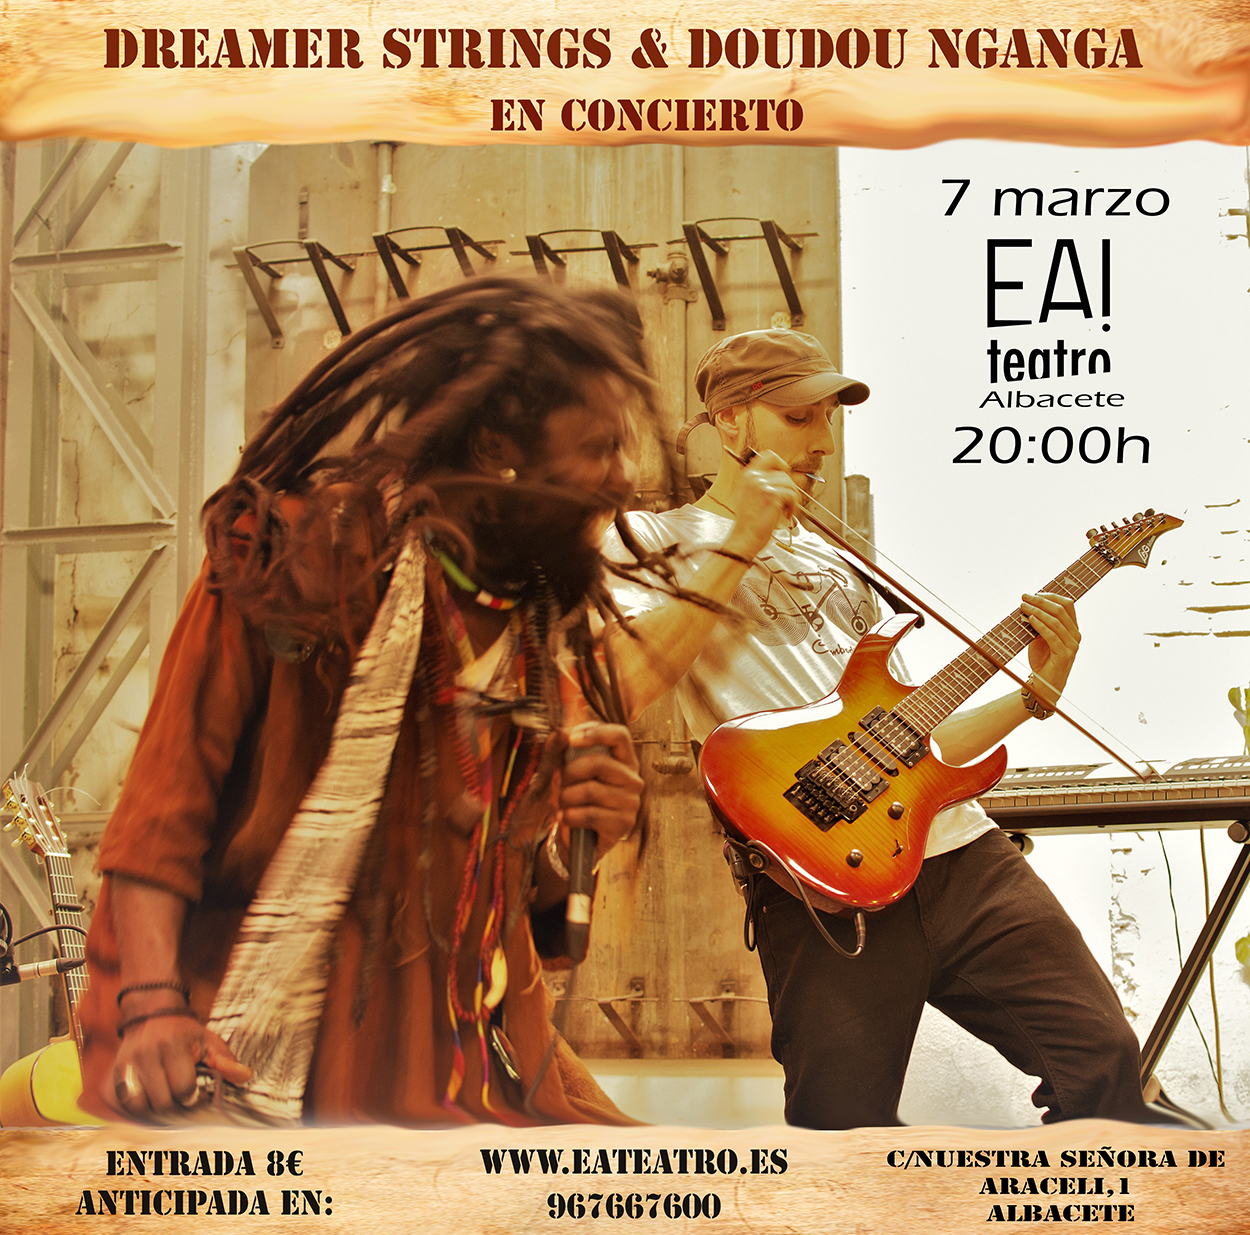 Dreamer Strings & Doudou Nganga